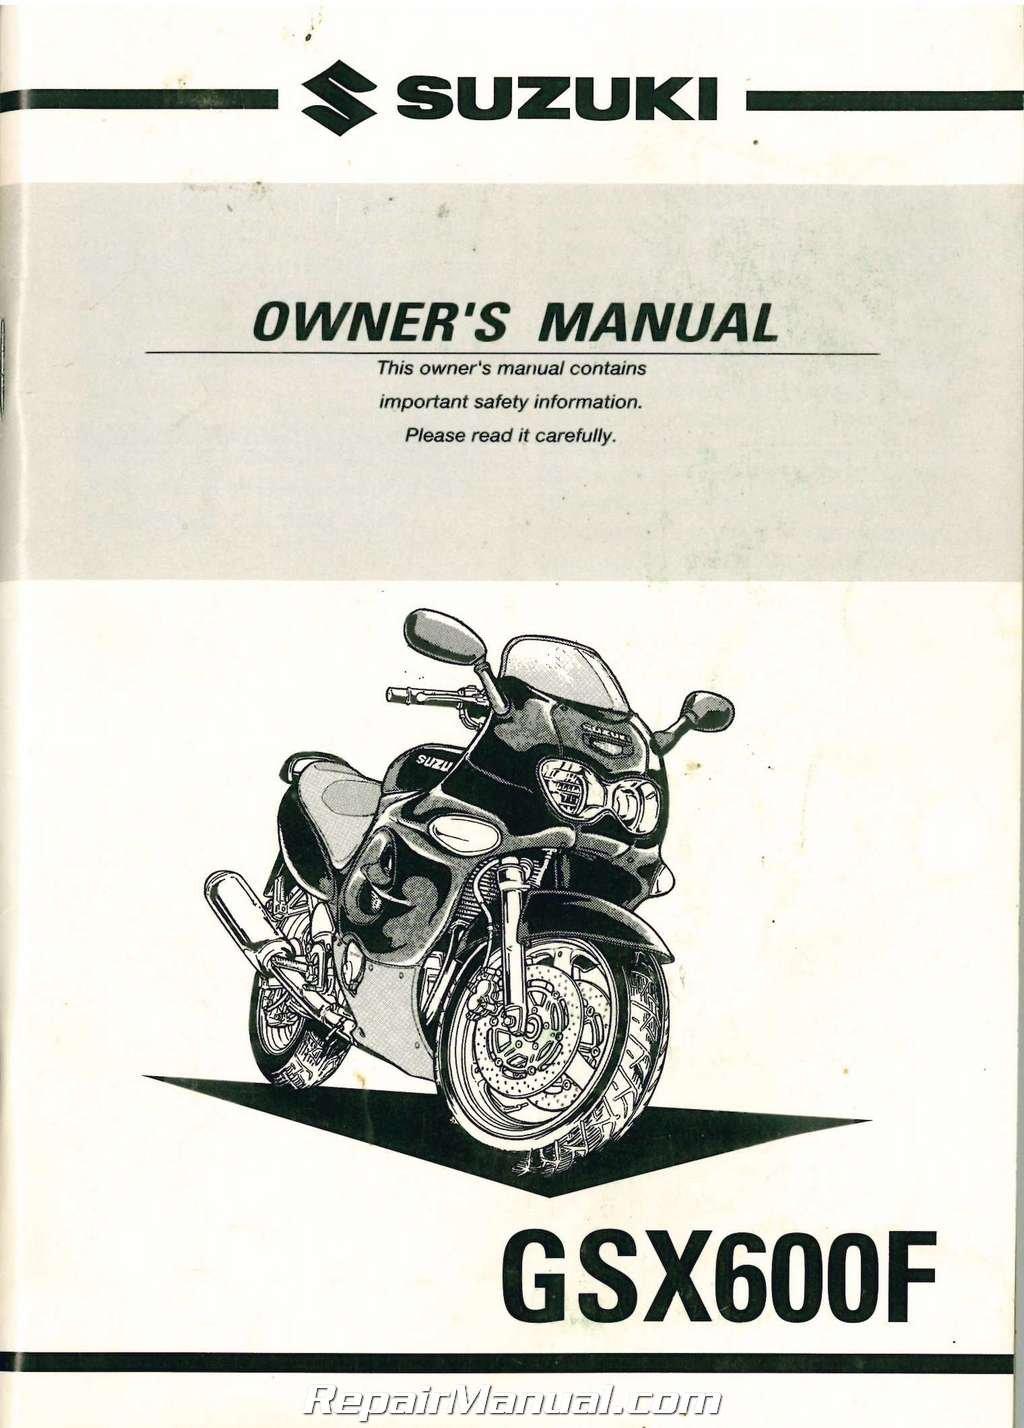 99011-19C62-03A 1999-2000 Suzuki Katana GSX600F Motorcycle Owners Manual:  Manufacturer: Amazon.com: Books